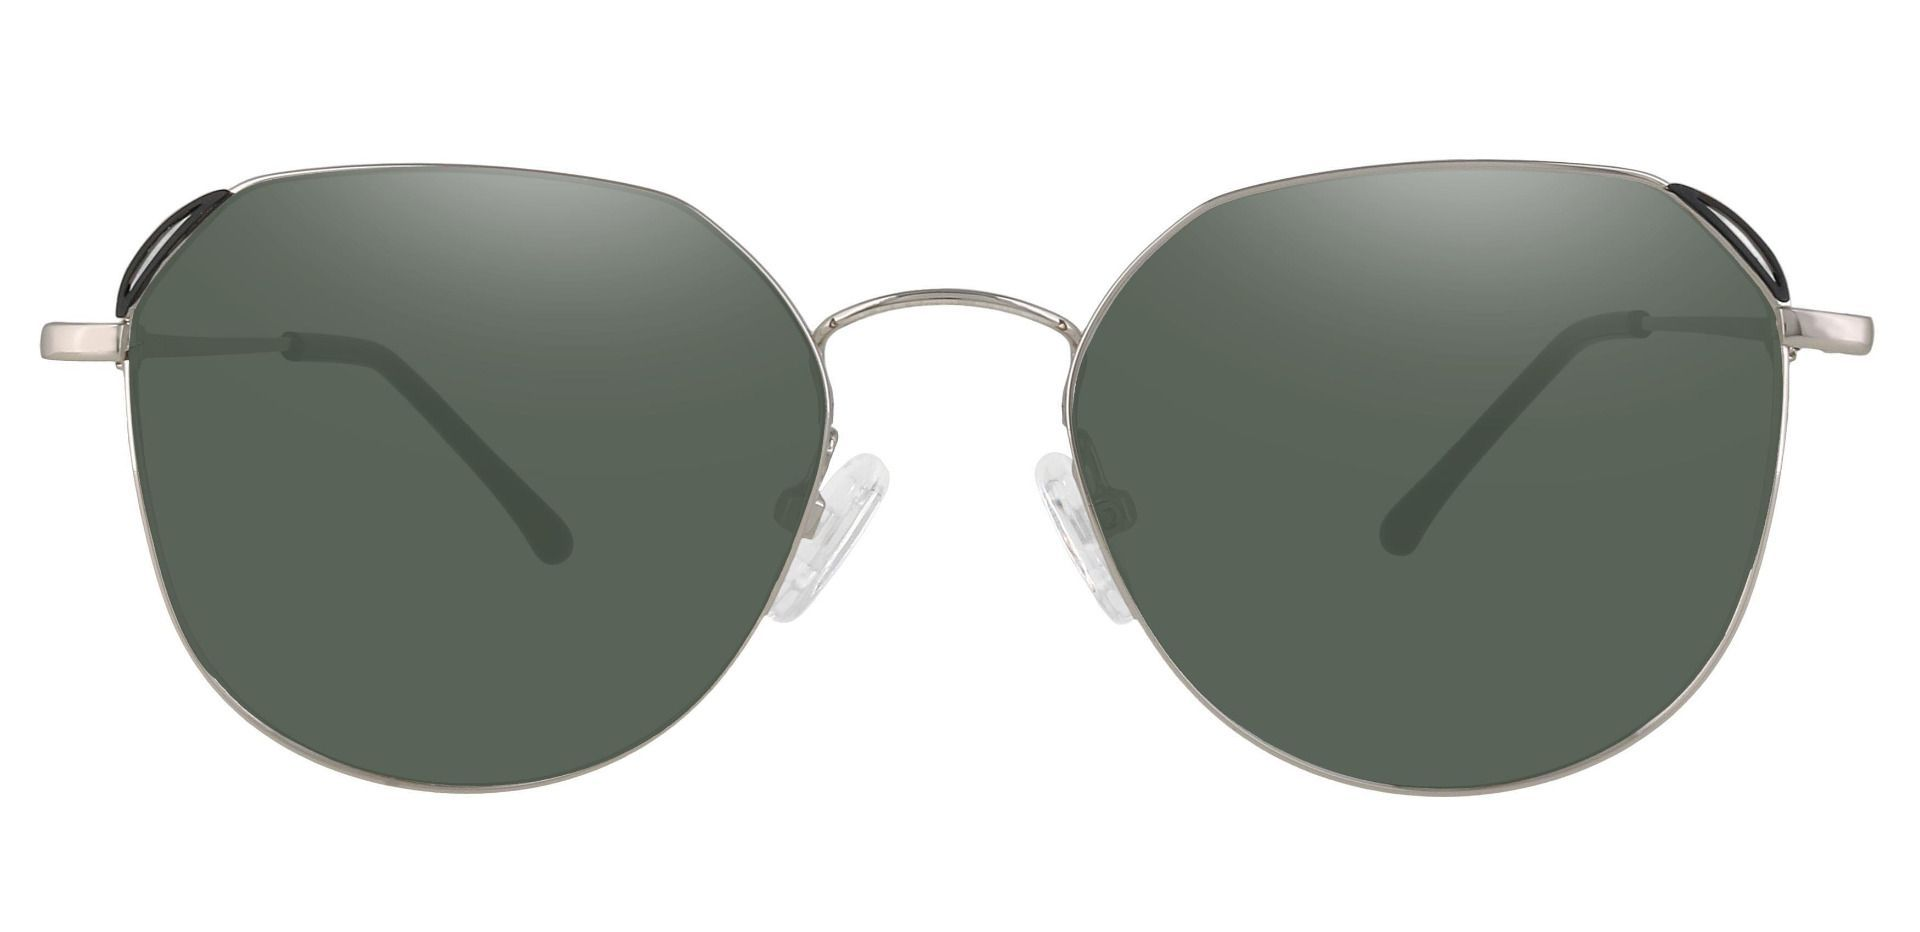 Figaro Geometric Progressive Sunglasses - Silver Frame With Green Lenses